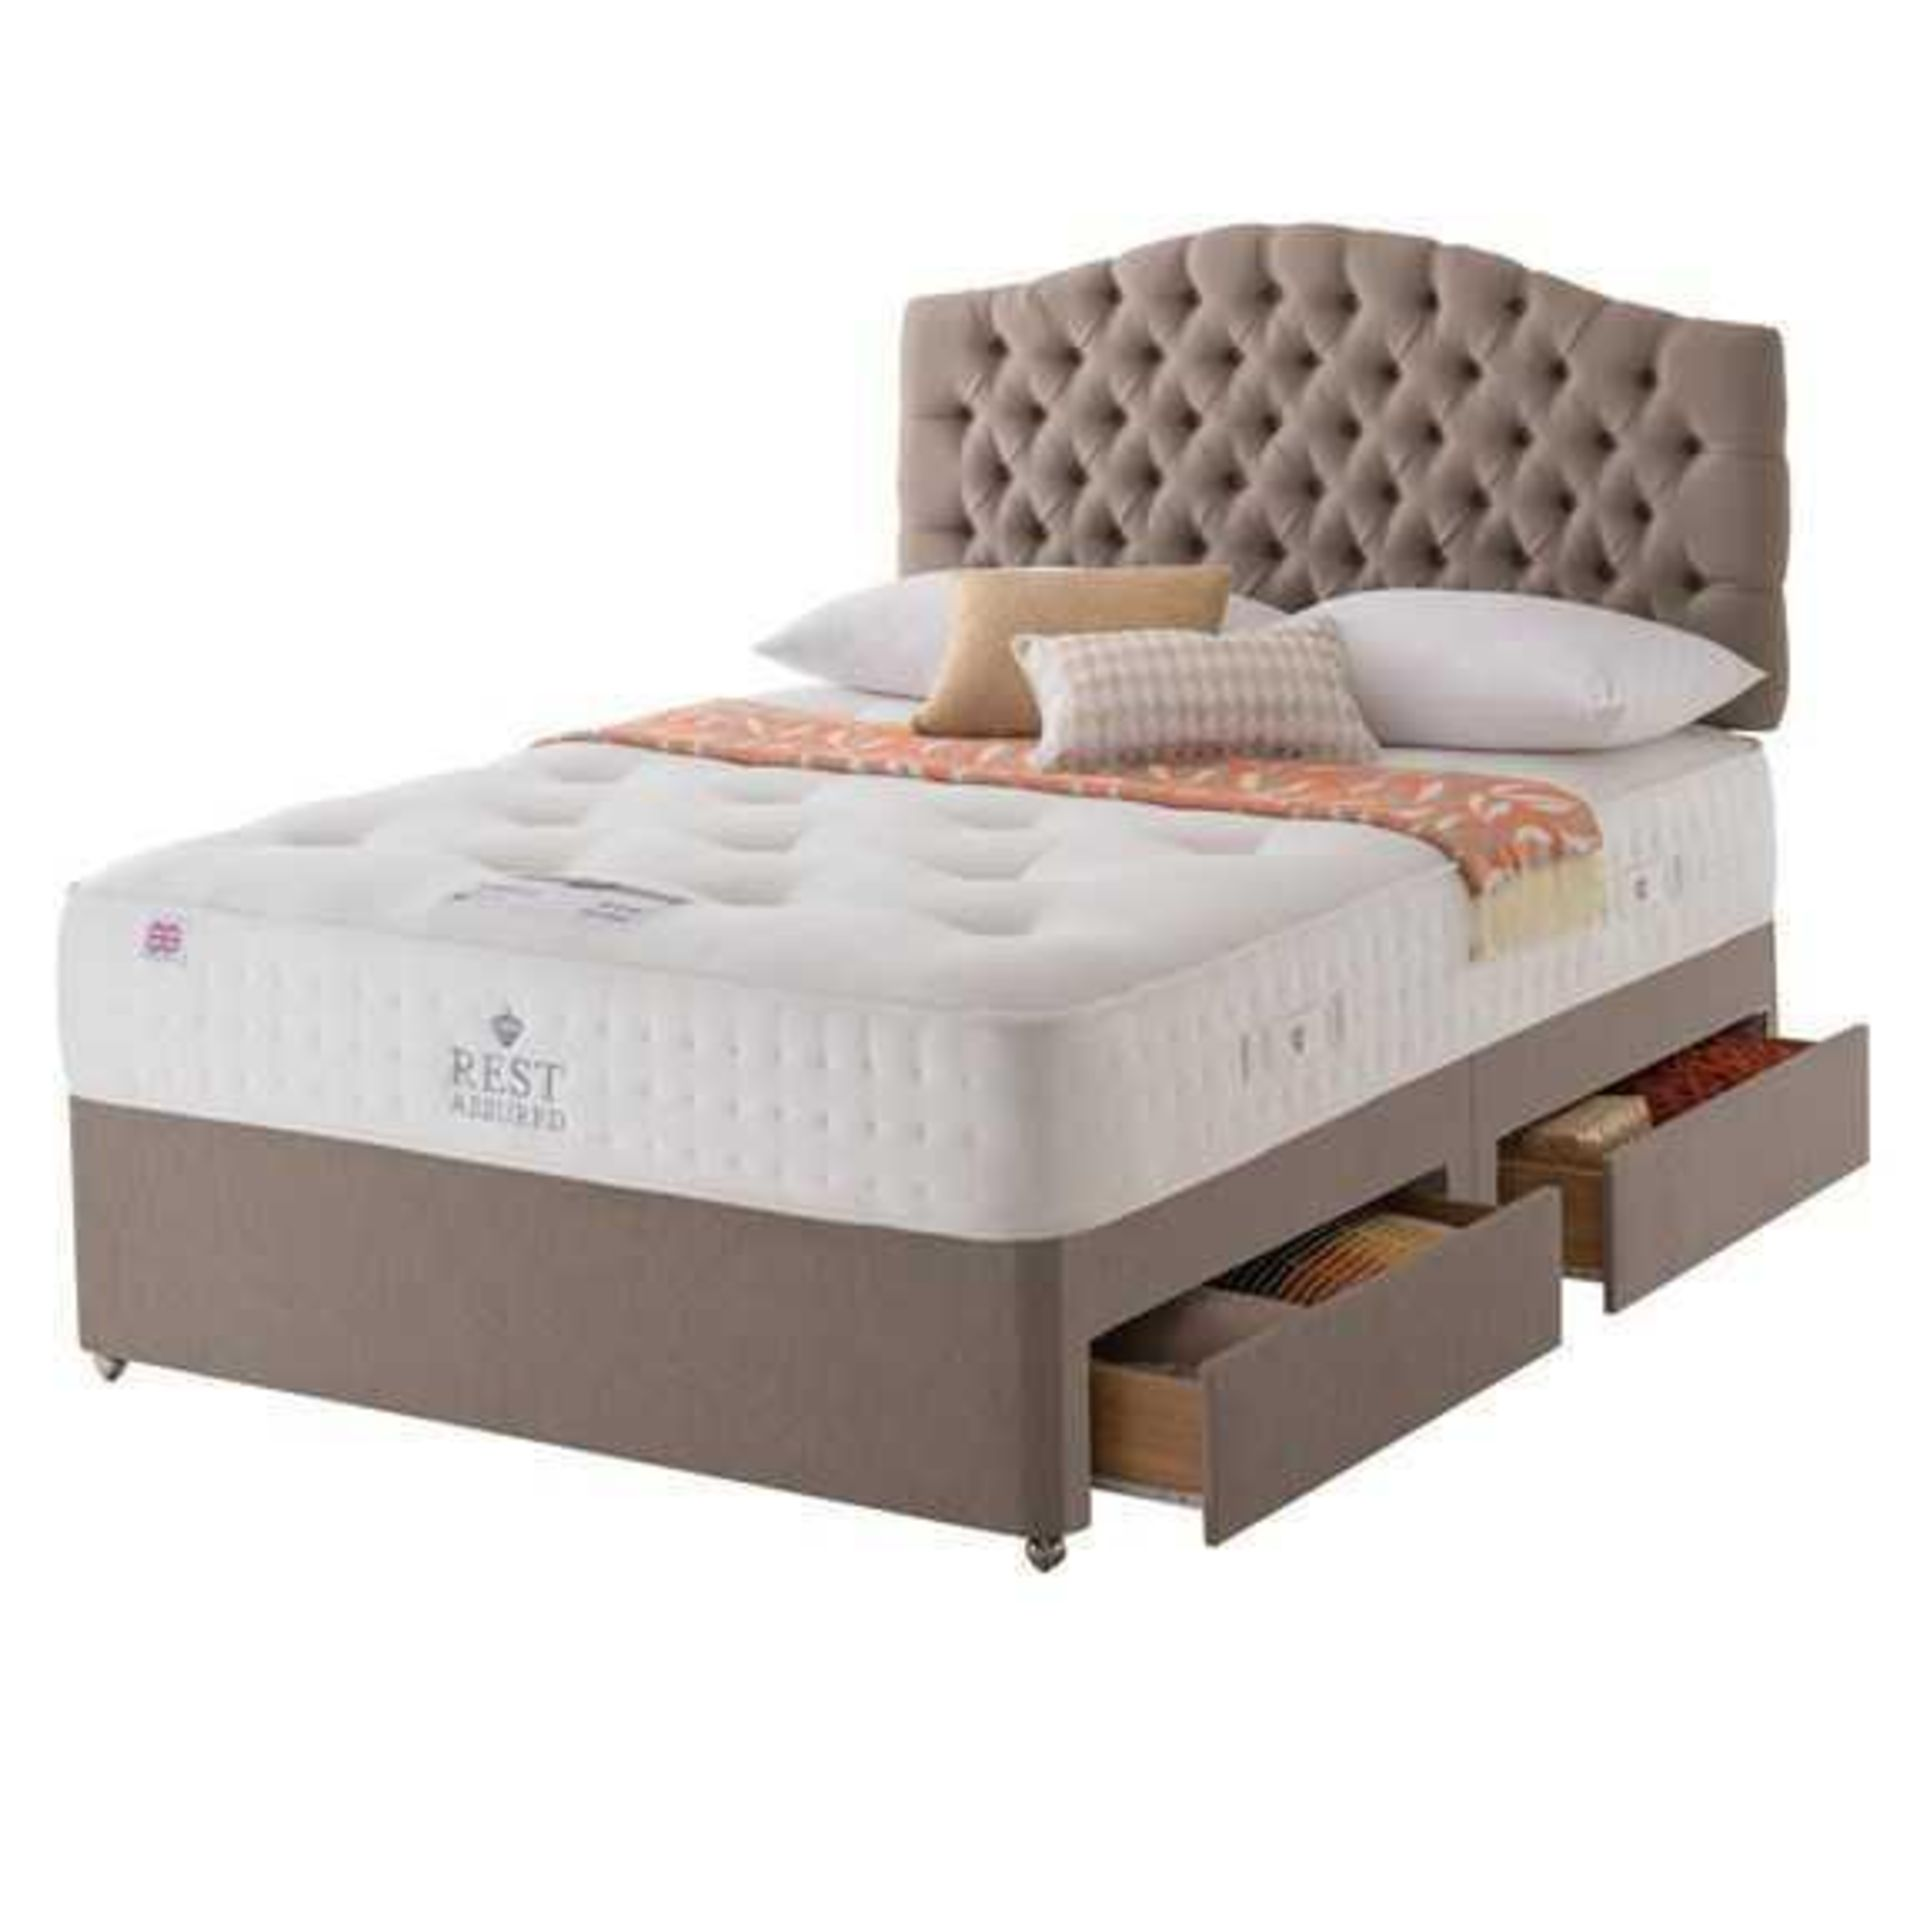 RRP £2100 Ex Showroom Rest Assured Natural Buckingham Tan 5Ft Bed Divan Bed With Mattress